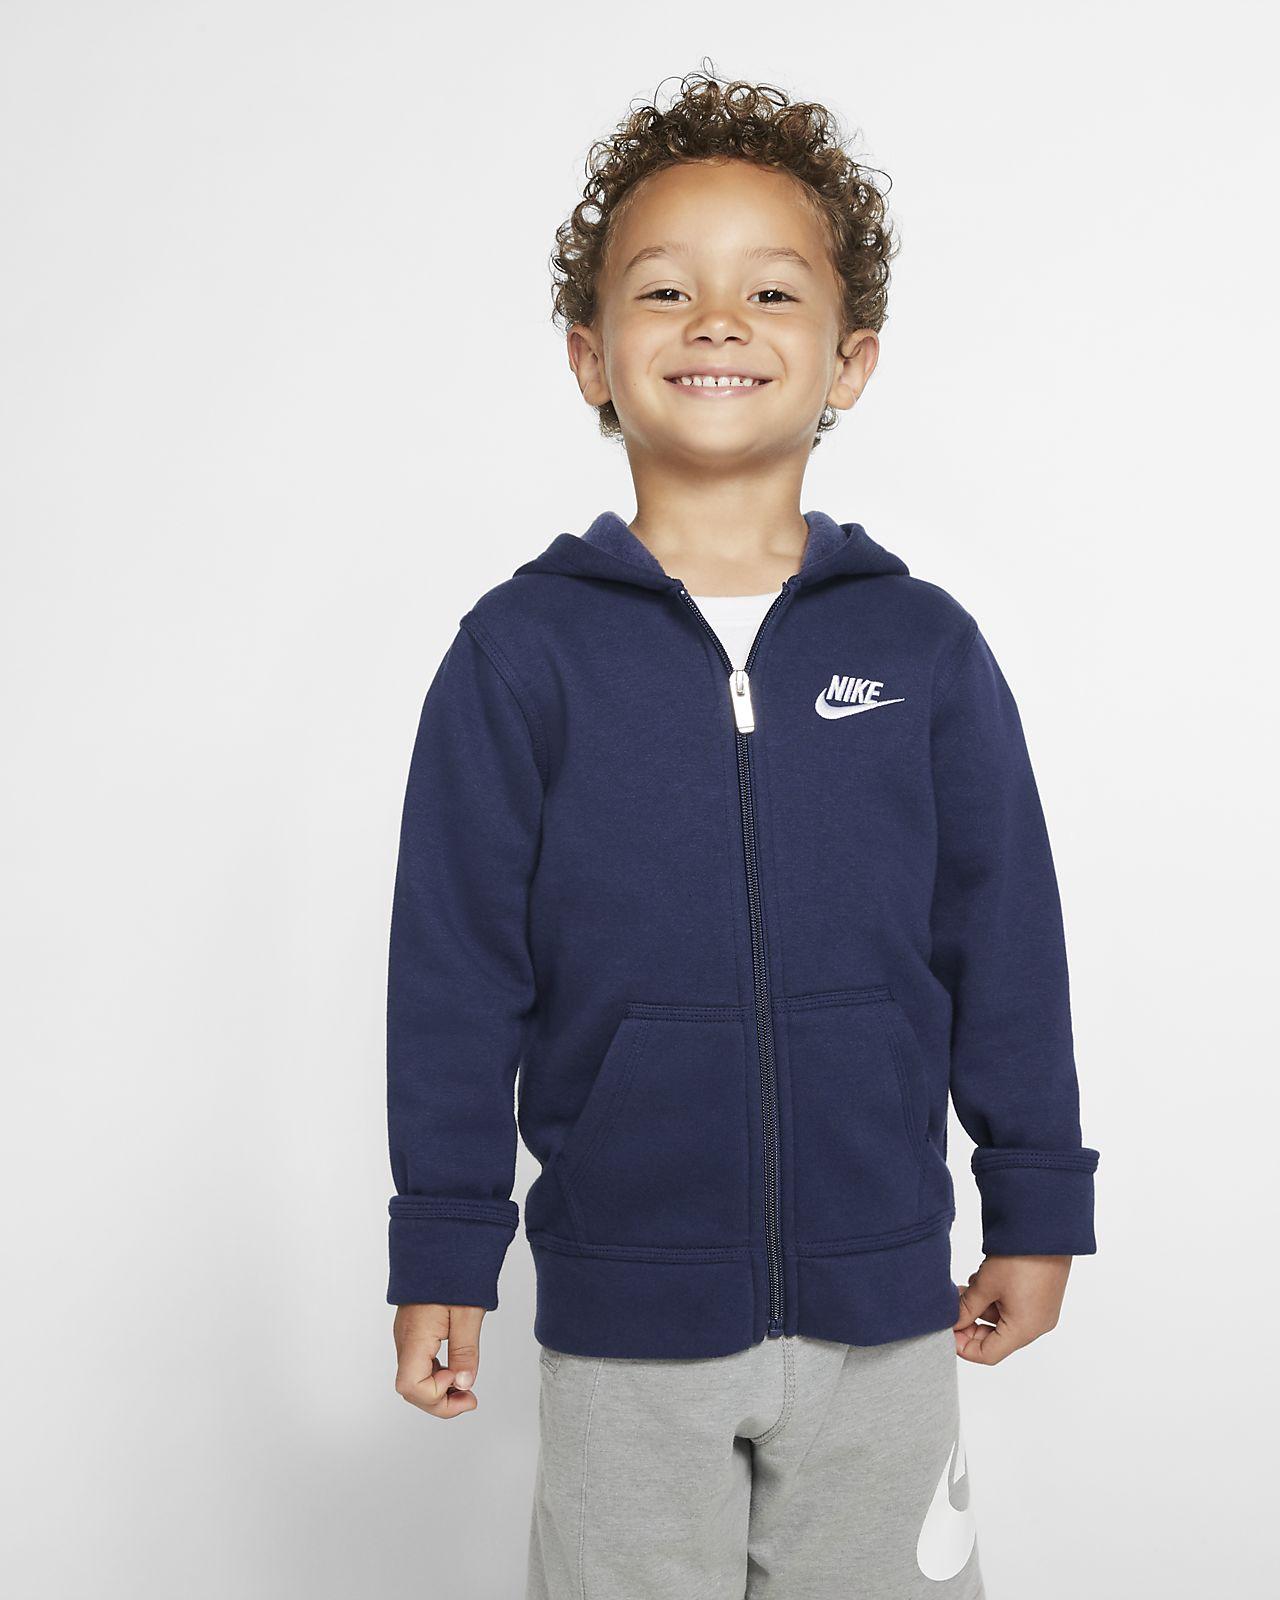 Nike Sportswear Club Fleece Dessuadora amb caputxa i cremallera completa - Nen/a petit/a